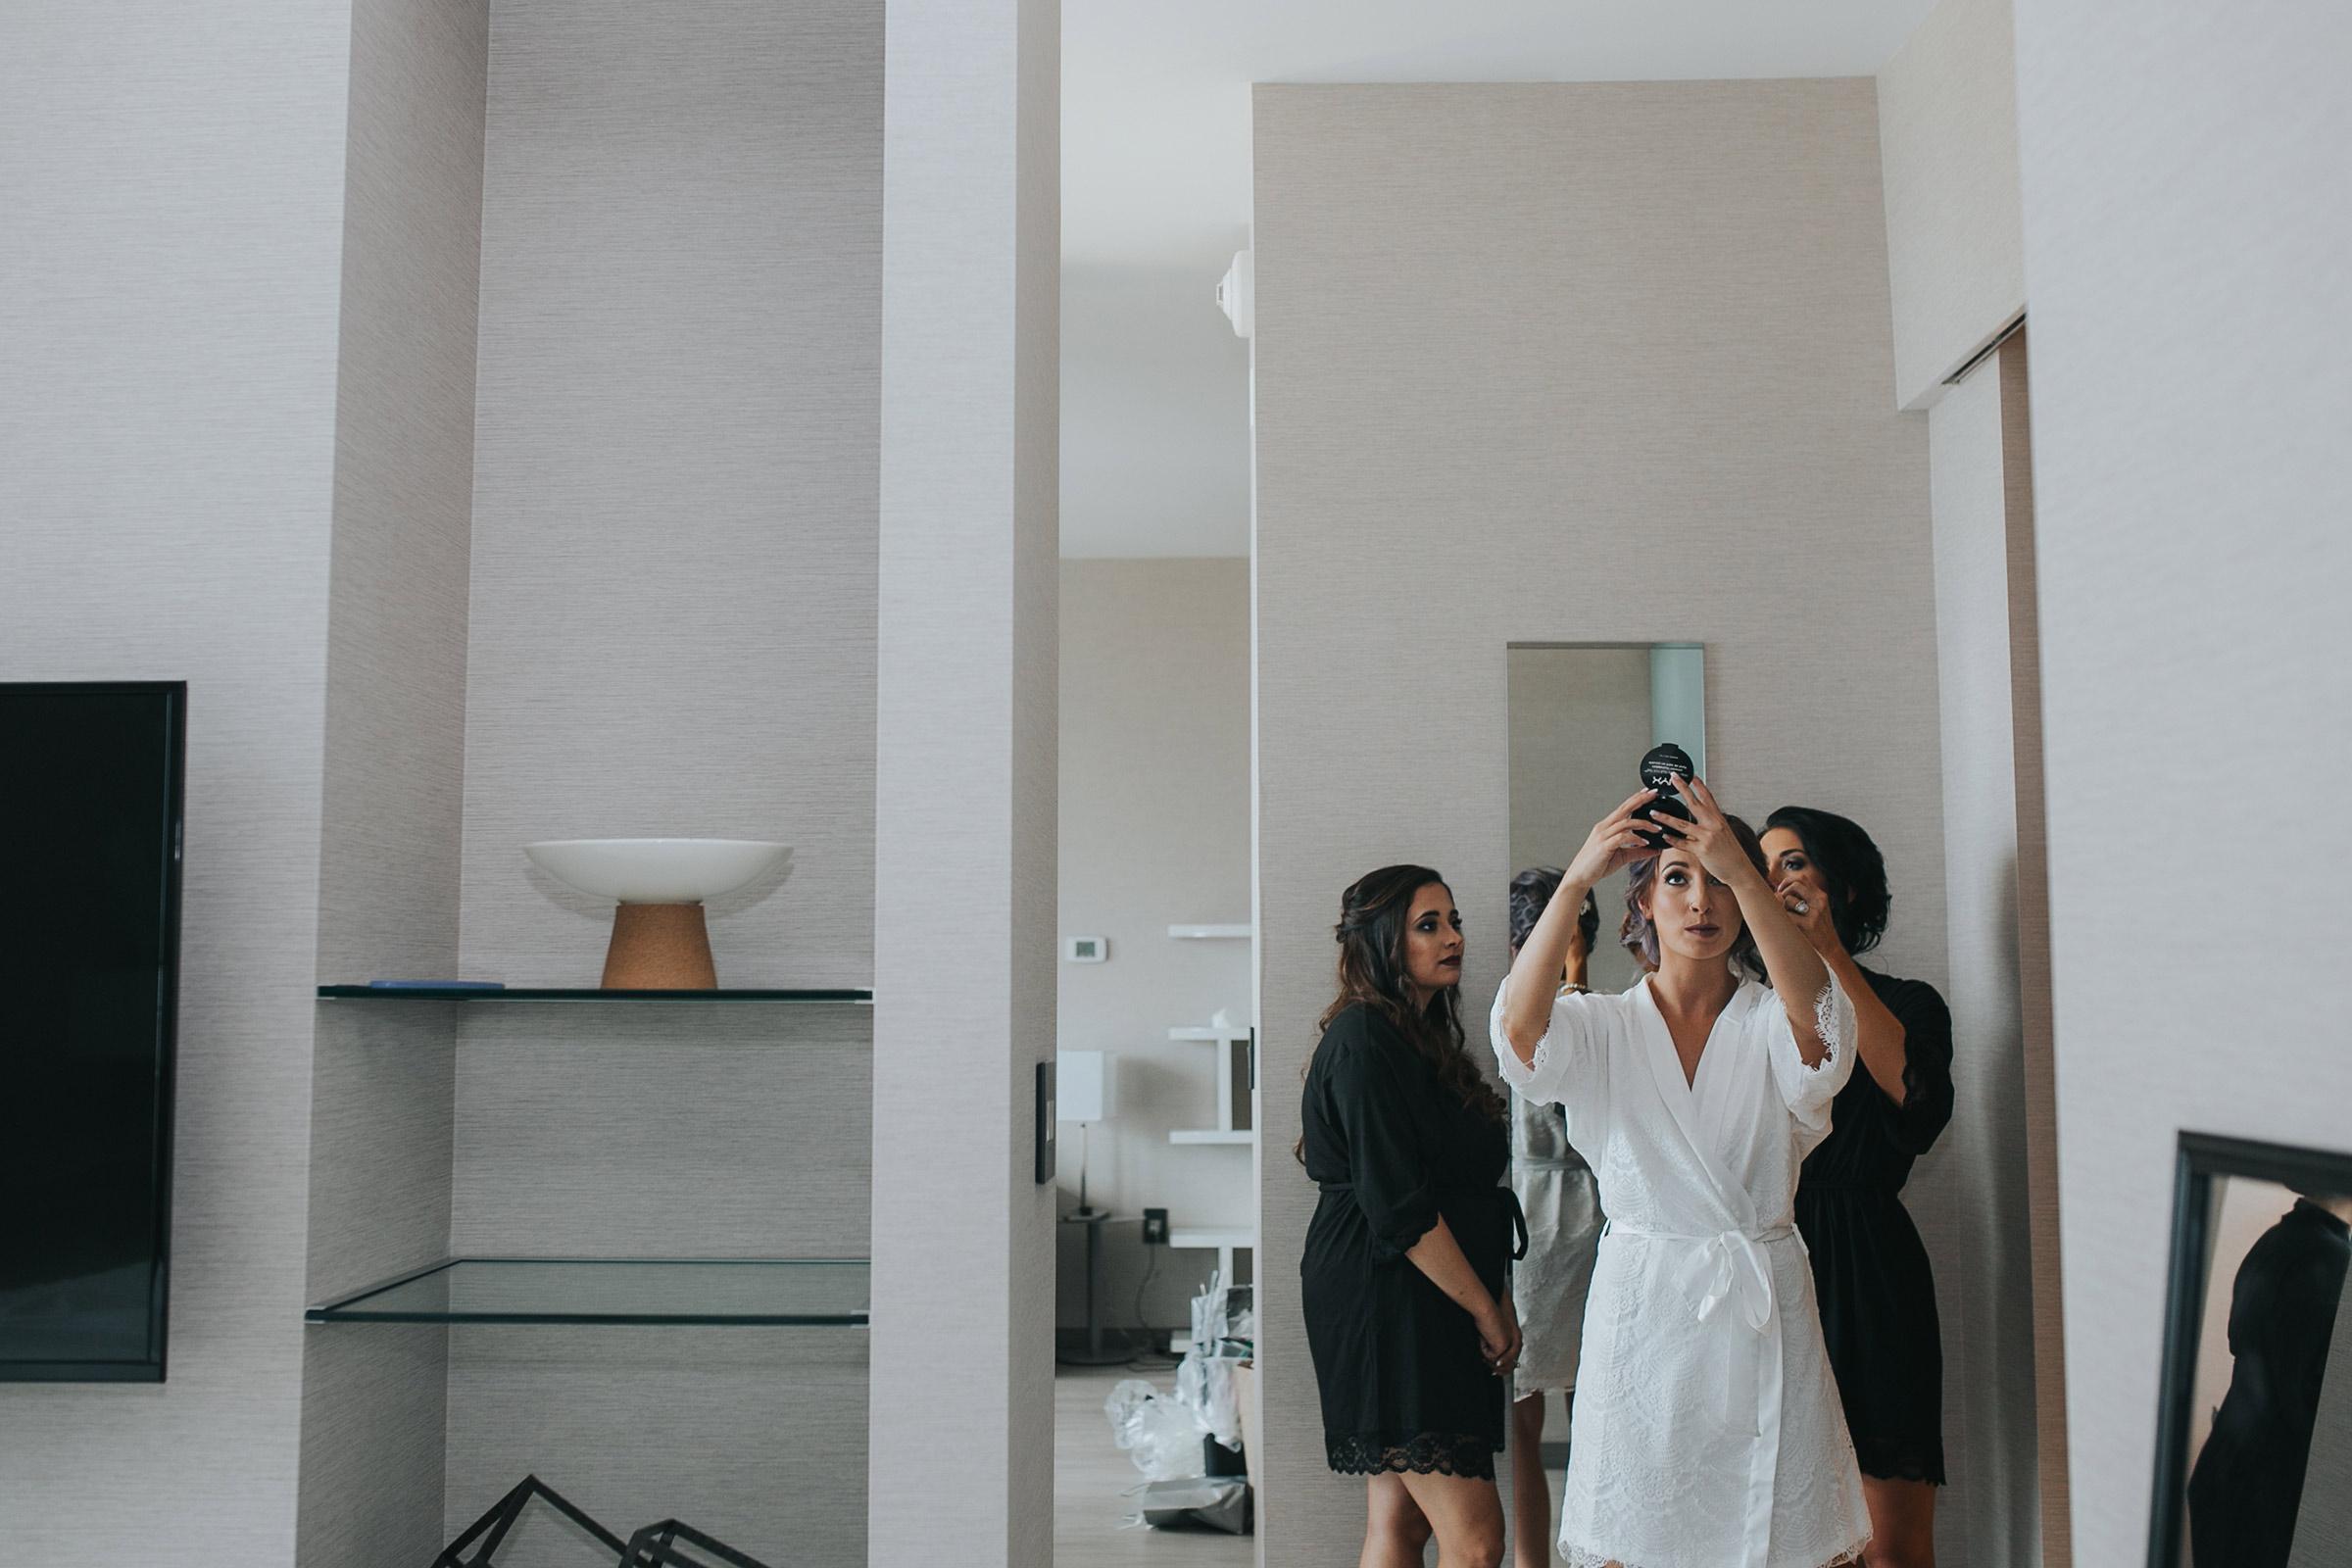 bride-checking-hair-in-mirror-desmoines-iowa-ac-hotel-raelyn-ramey-photography.jpg